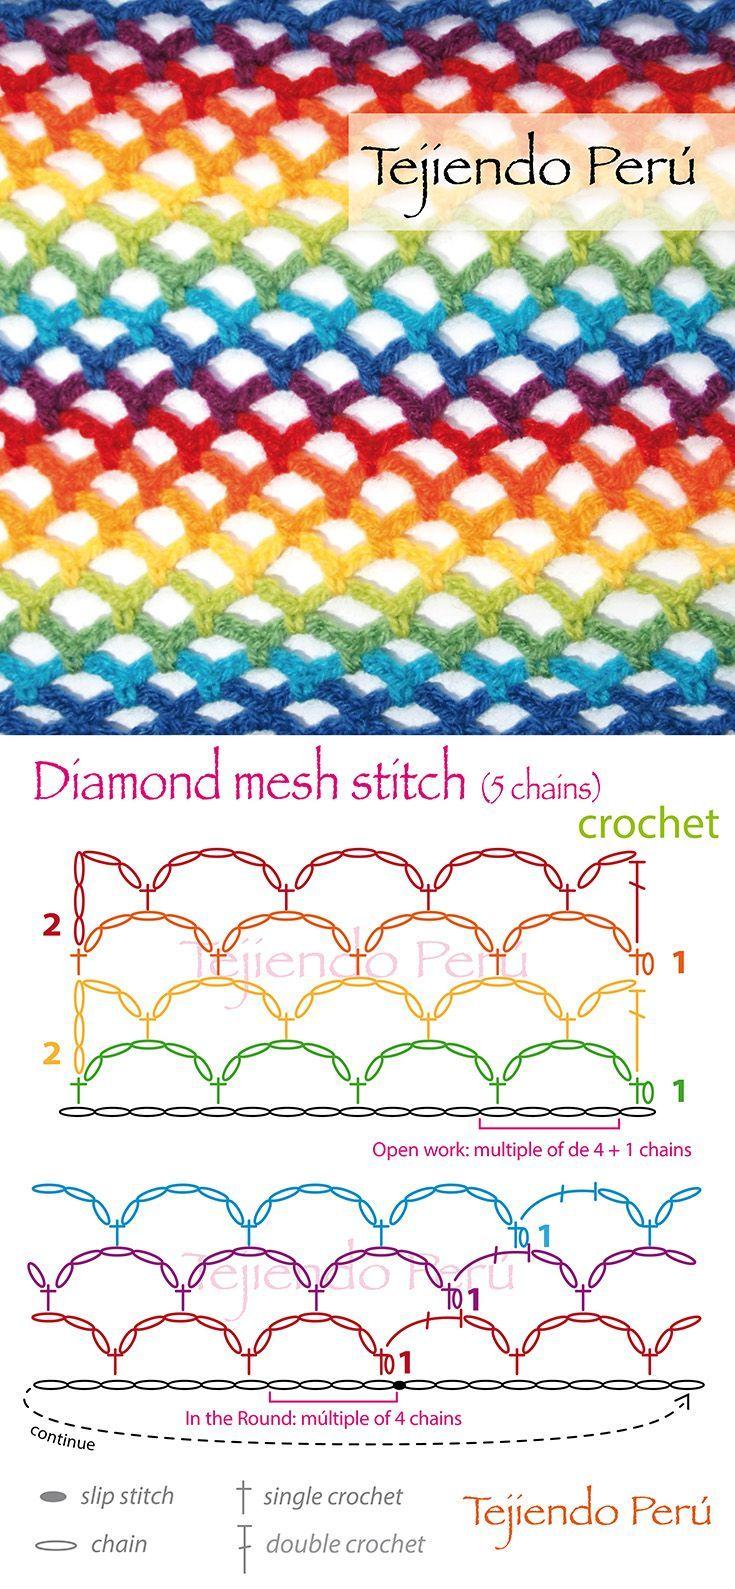 Crochet Diamond Mesh Stitch 5 Chains Diagram Pattern Or Chart